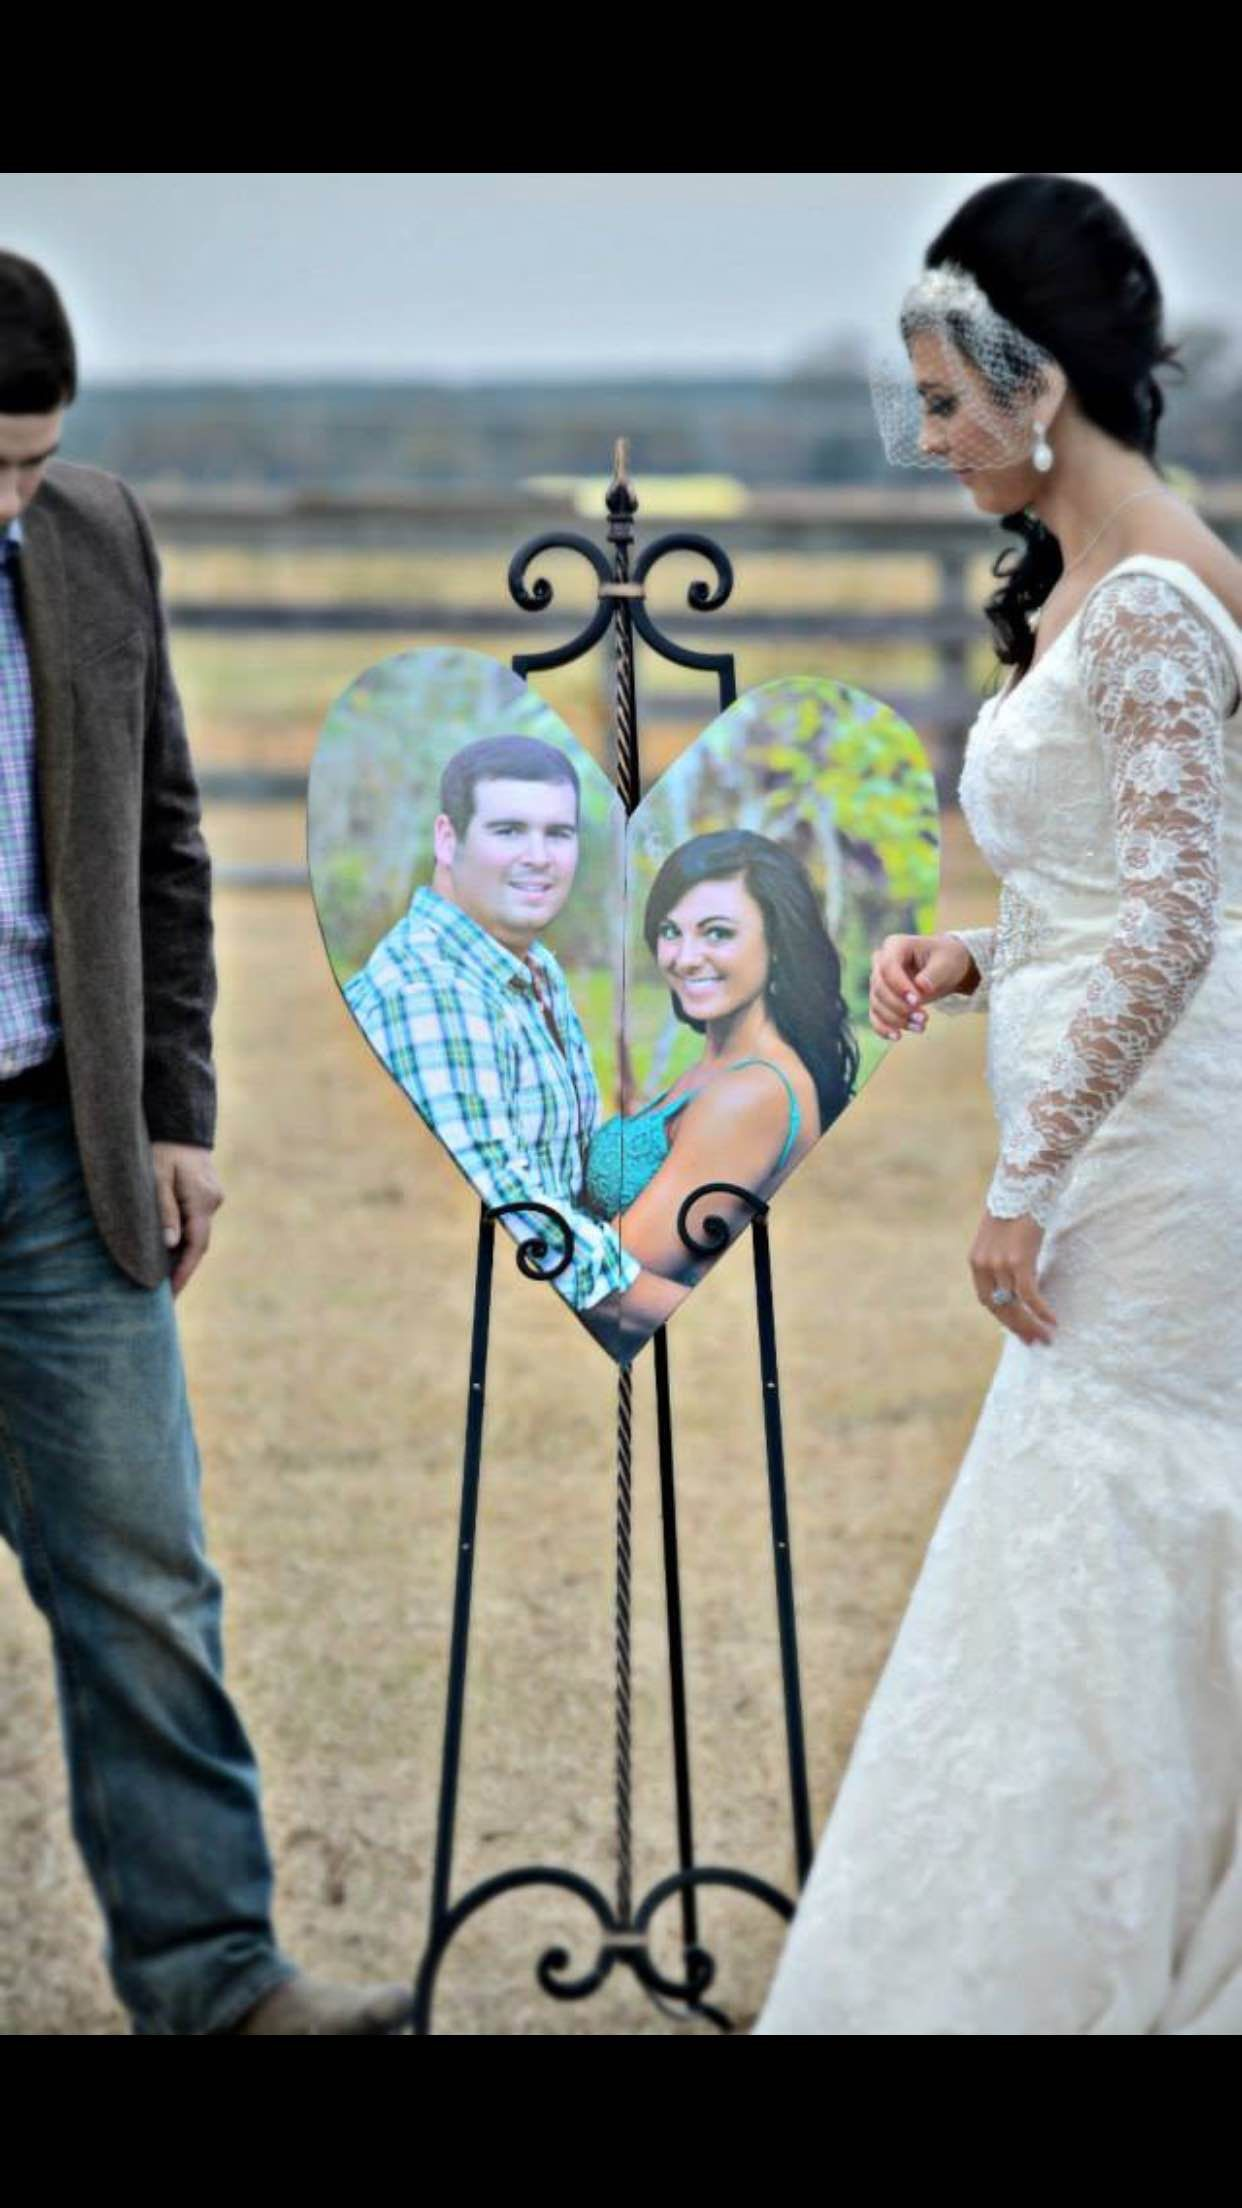 Unique Unity Ceremony Ideas Wedding Different Photo Heart Made